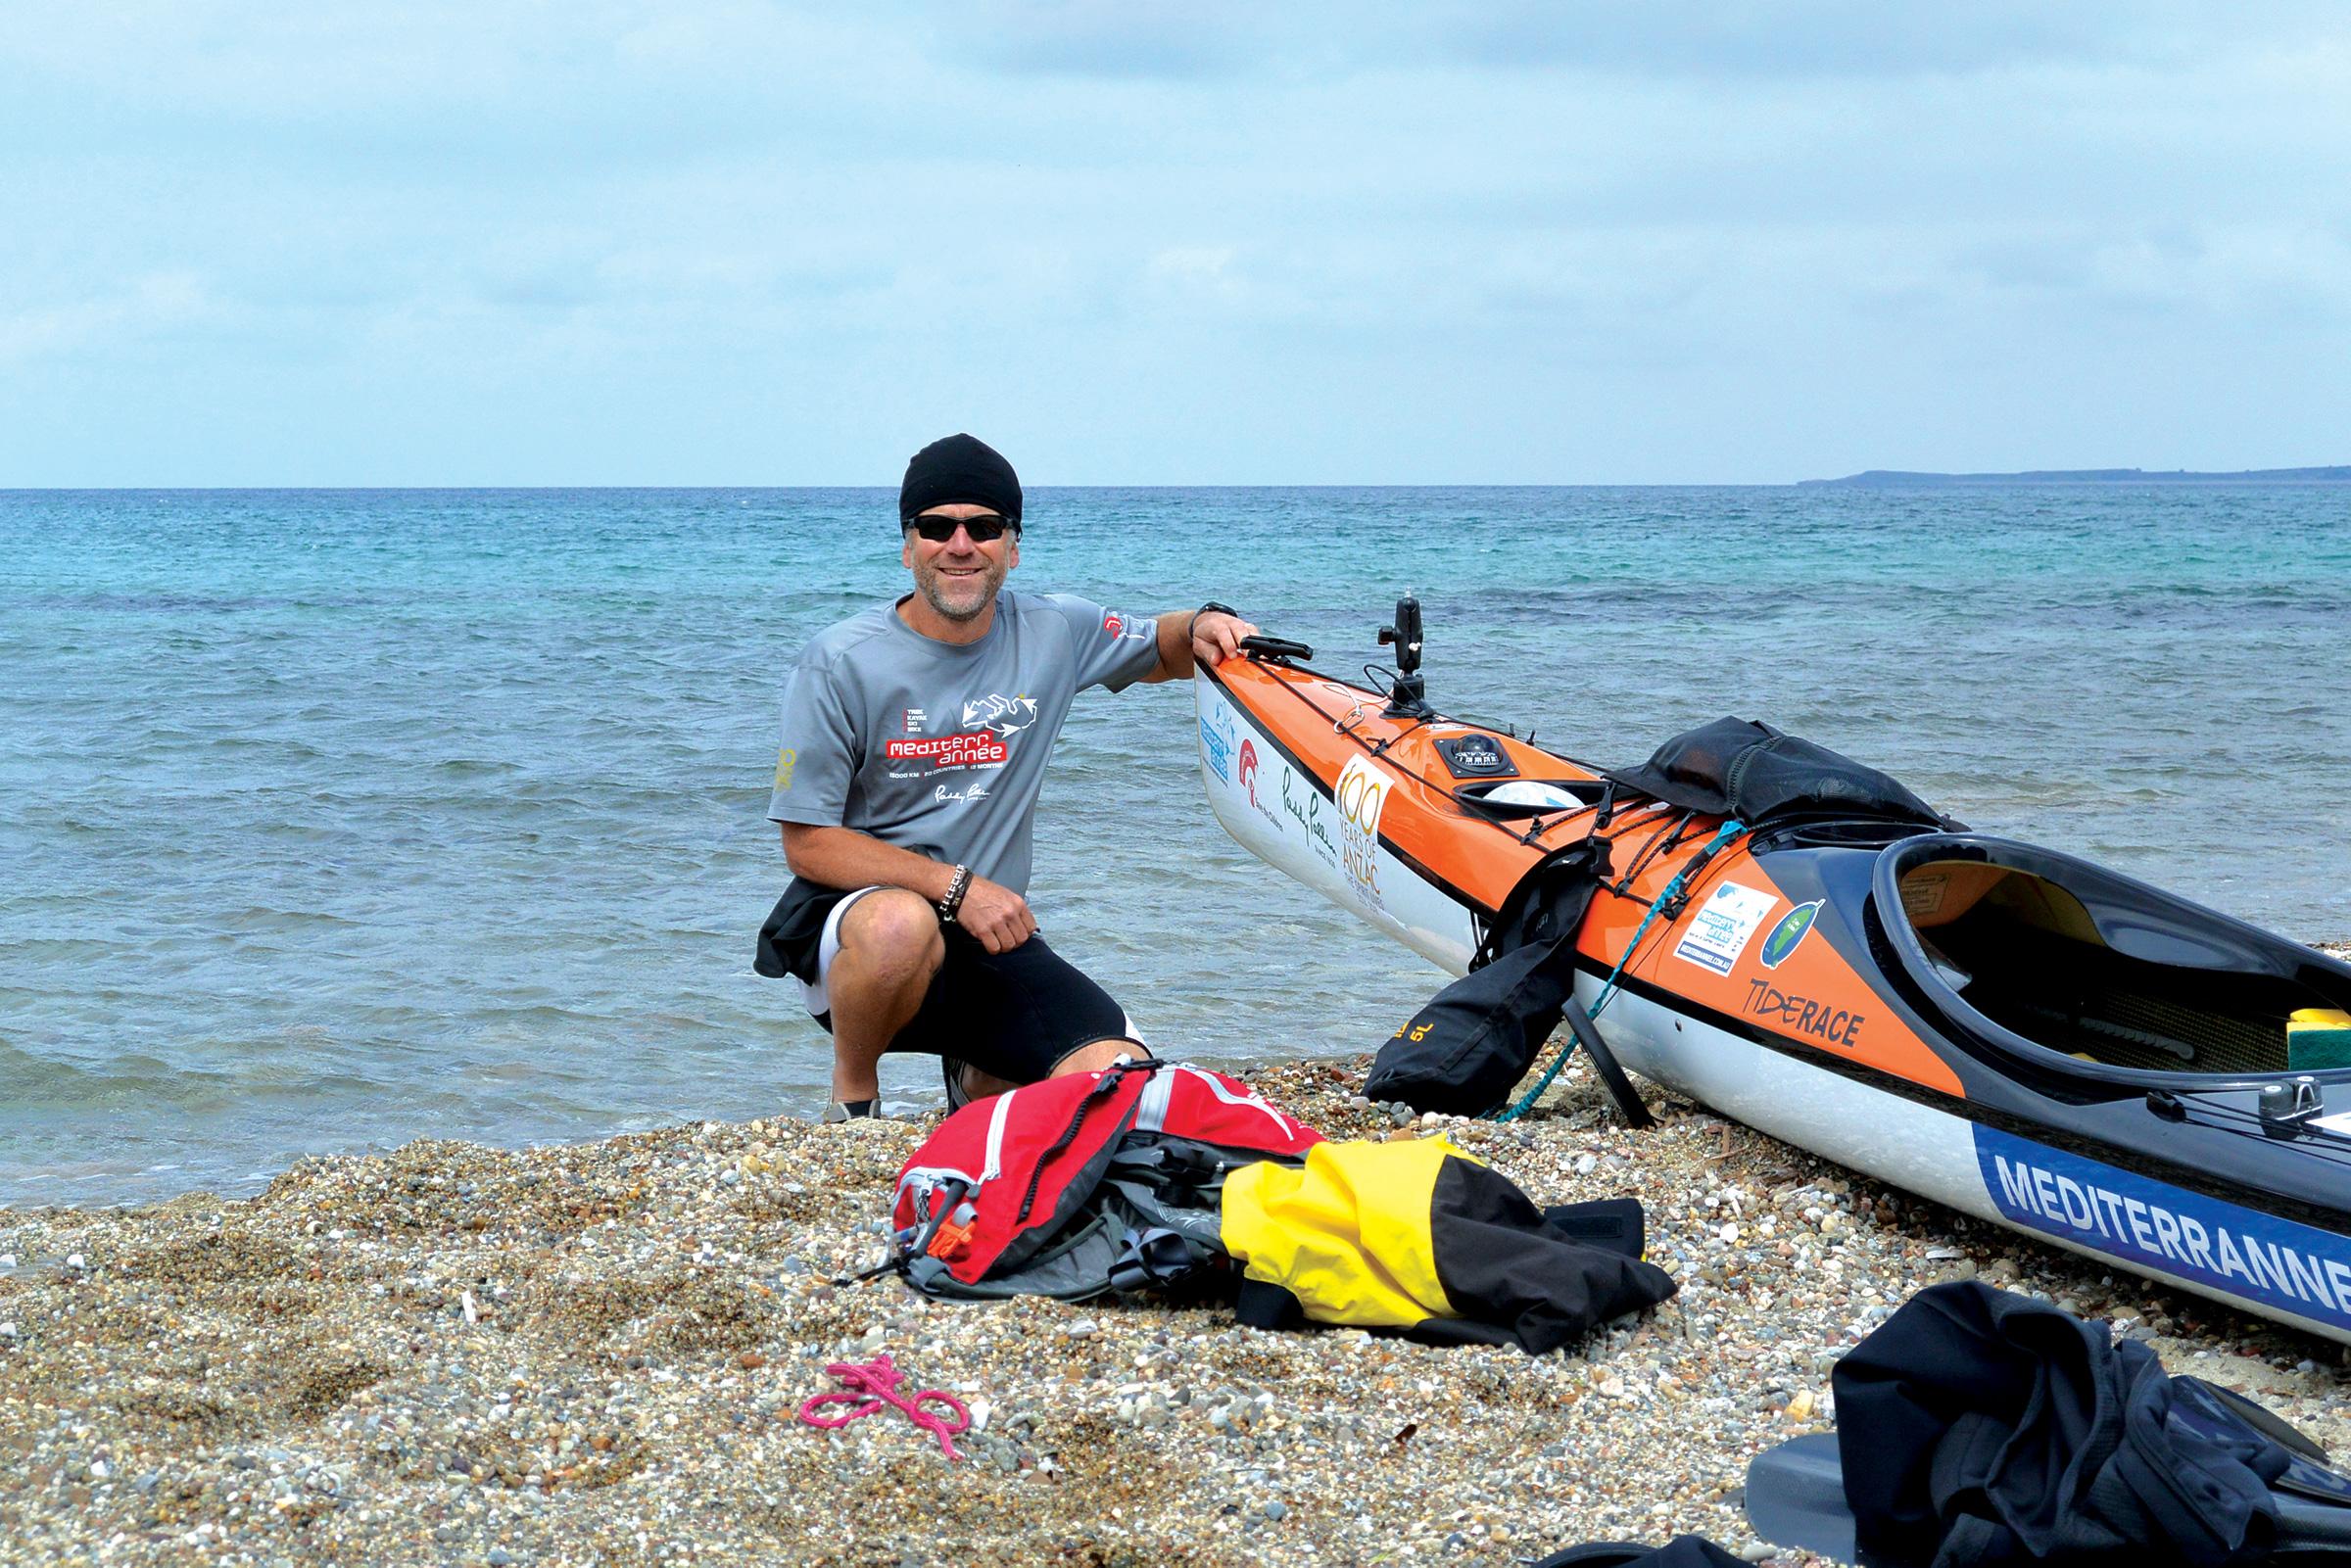 Huw preparing to leave Anzac Cove. PICTURE CREDIT: Marco Costa